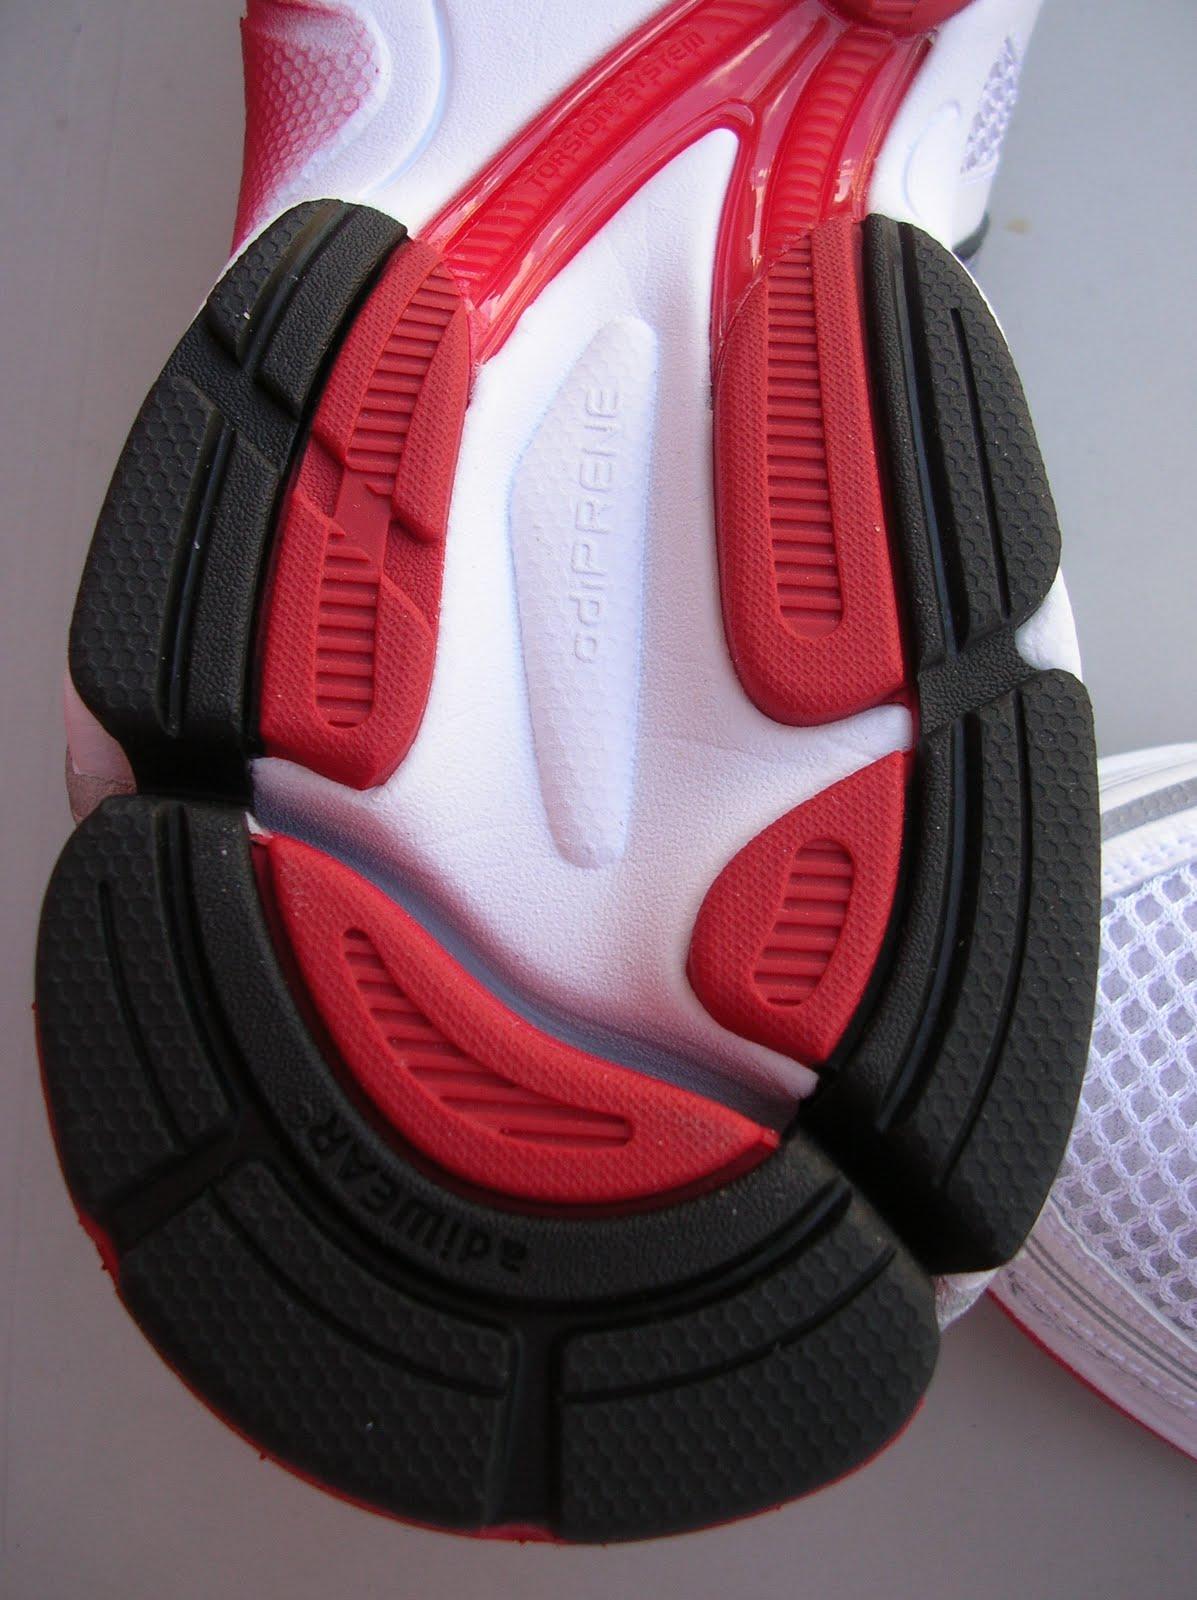 Filippo Running and Much More: Adidas Response Cushion 19